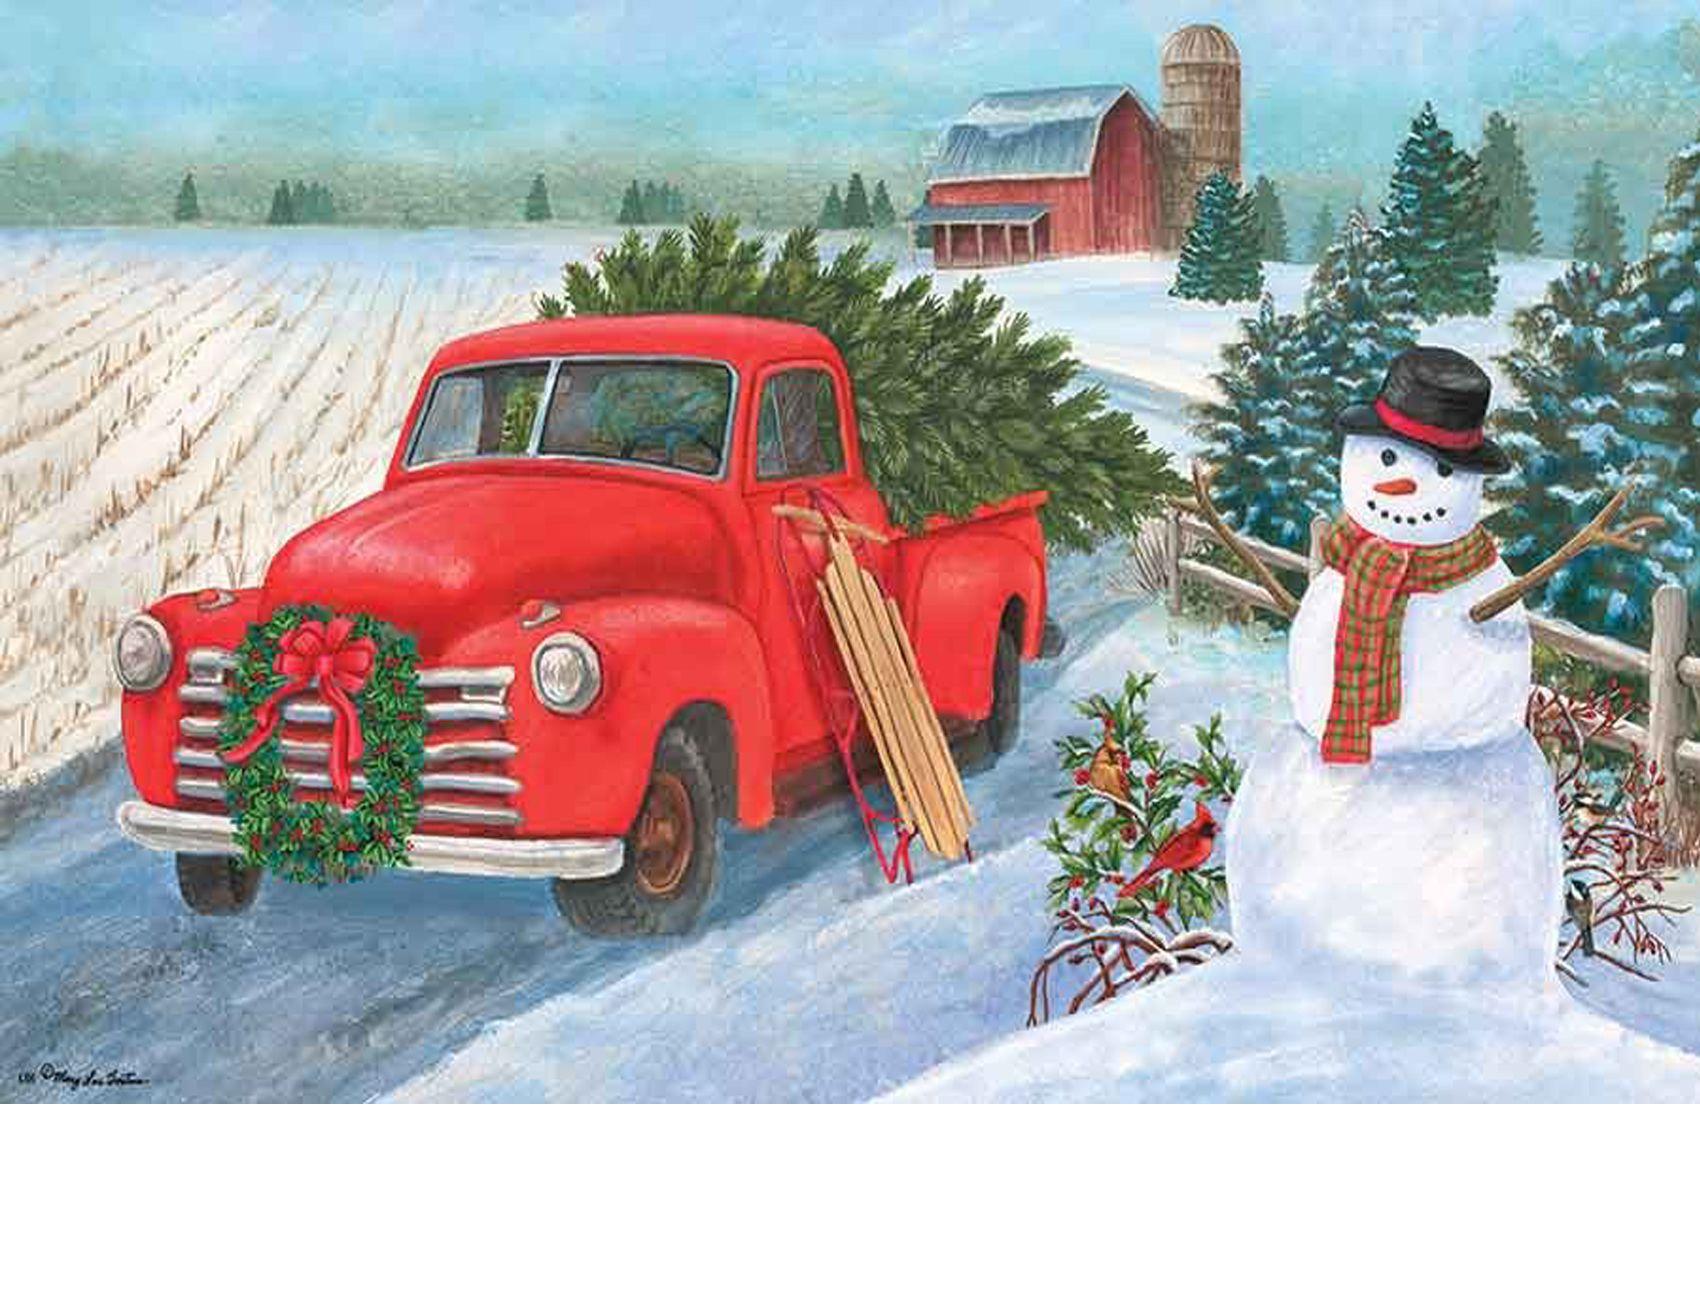 Christmas Red Truck.Red Truck Red Truck Christmas Red Truck Christmas